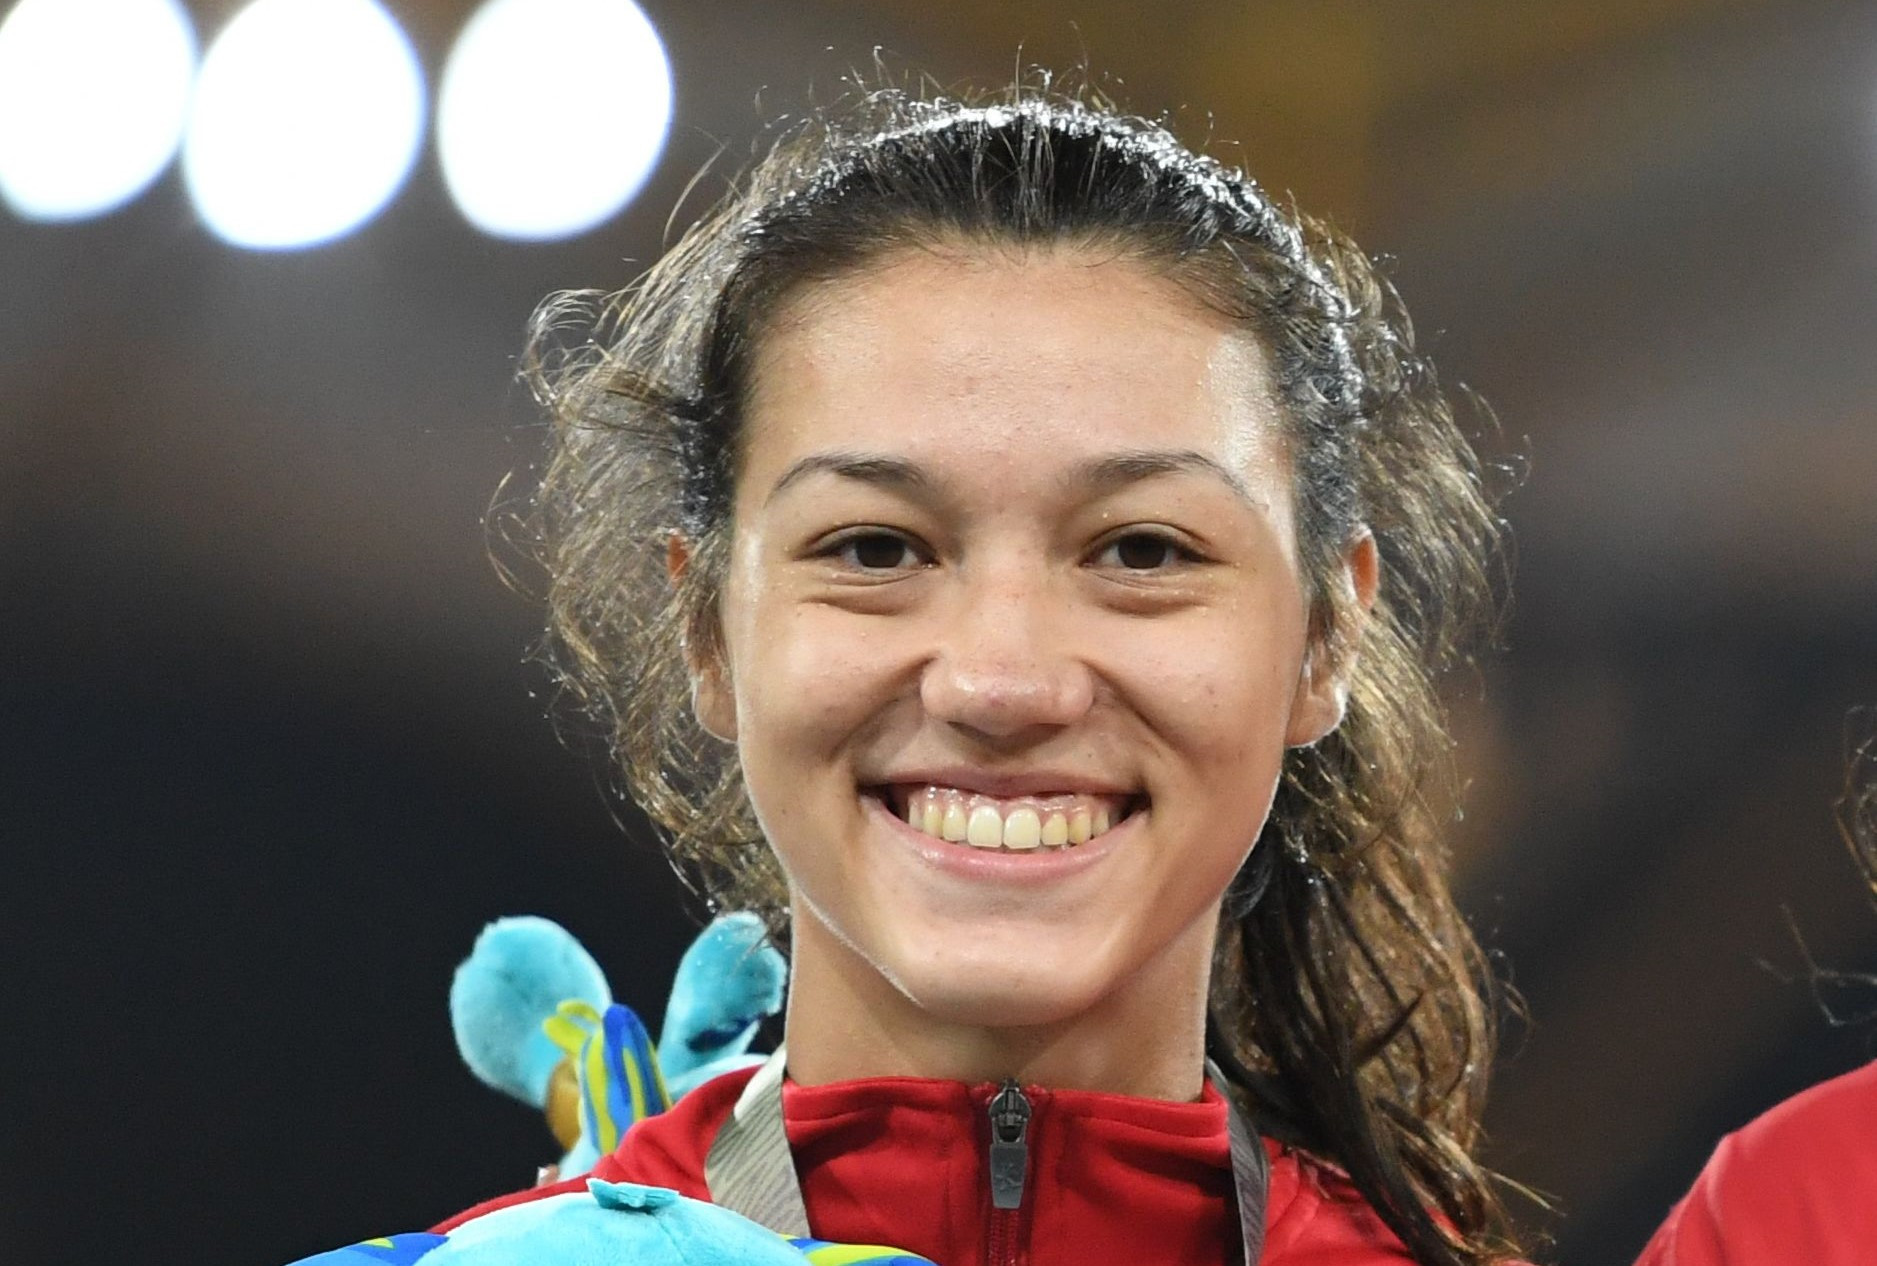 Zheng Ninali won the heptathlon in Arona ©Getty Images